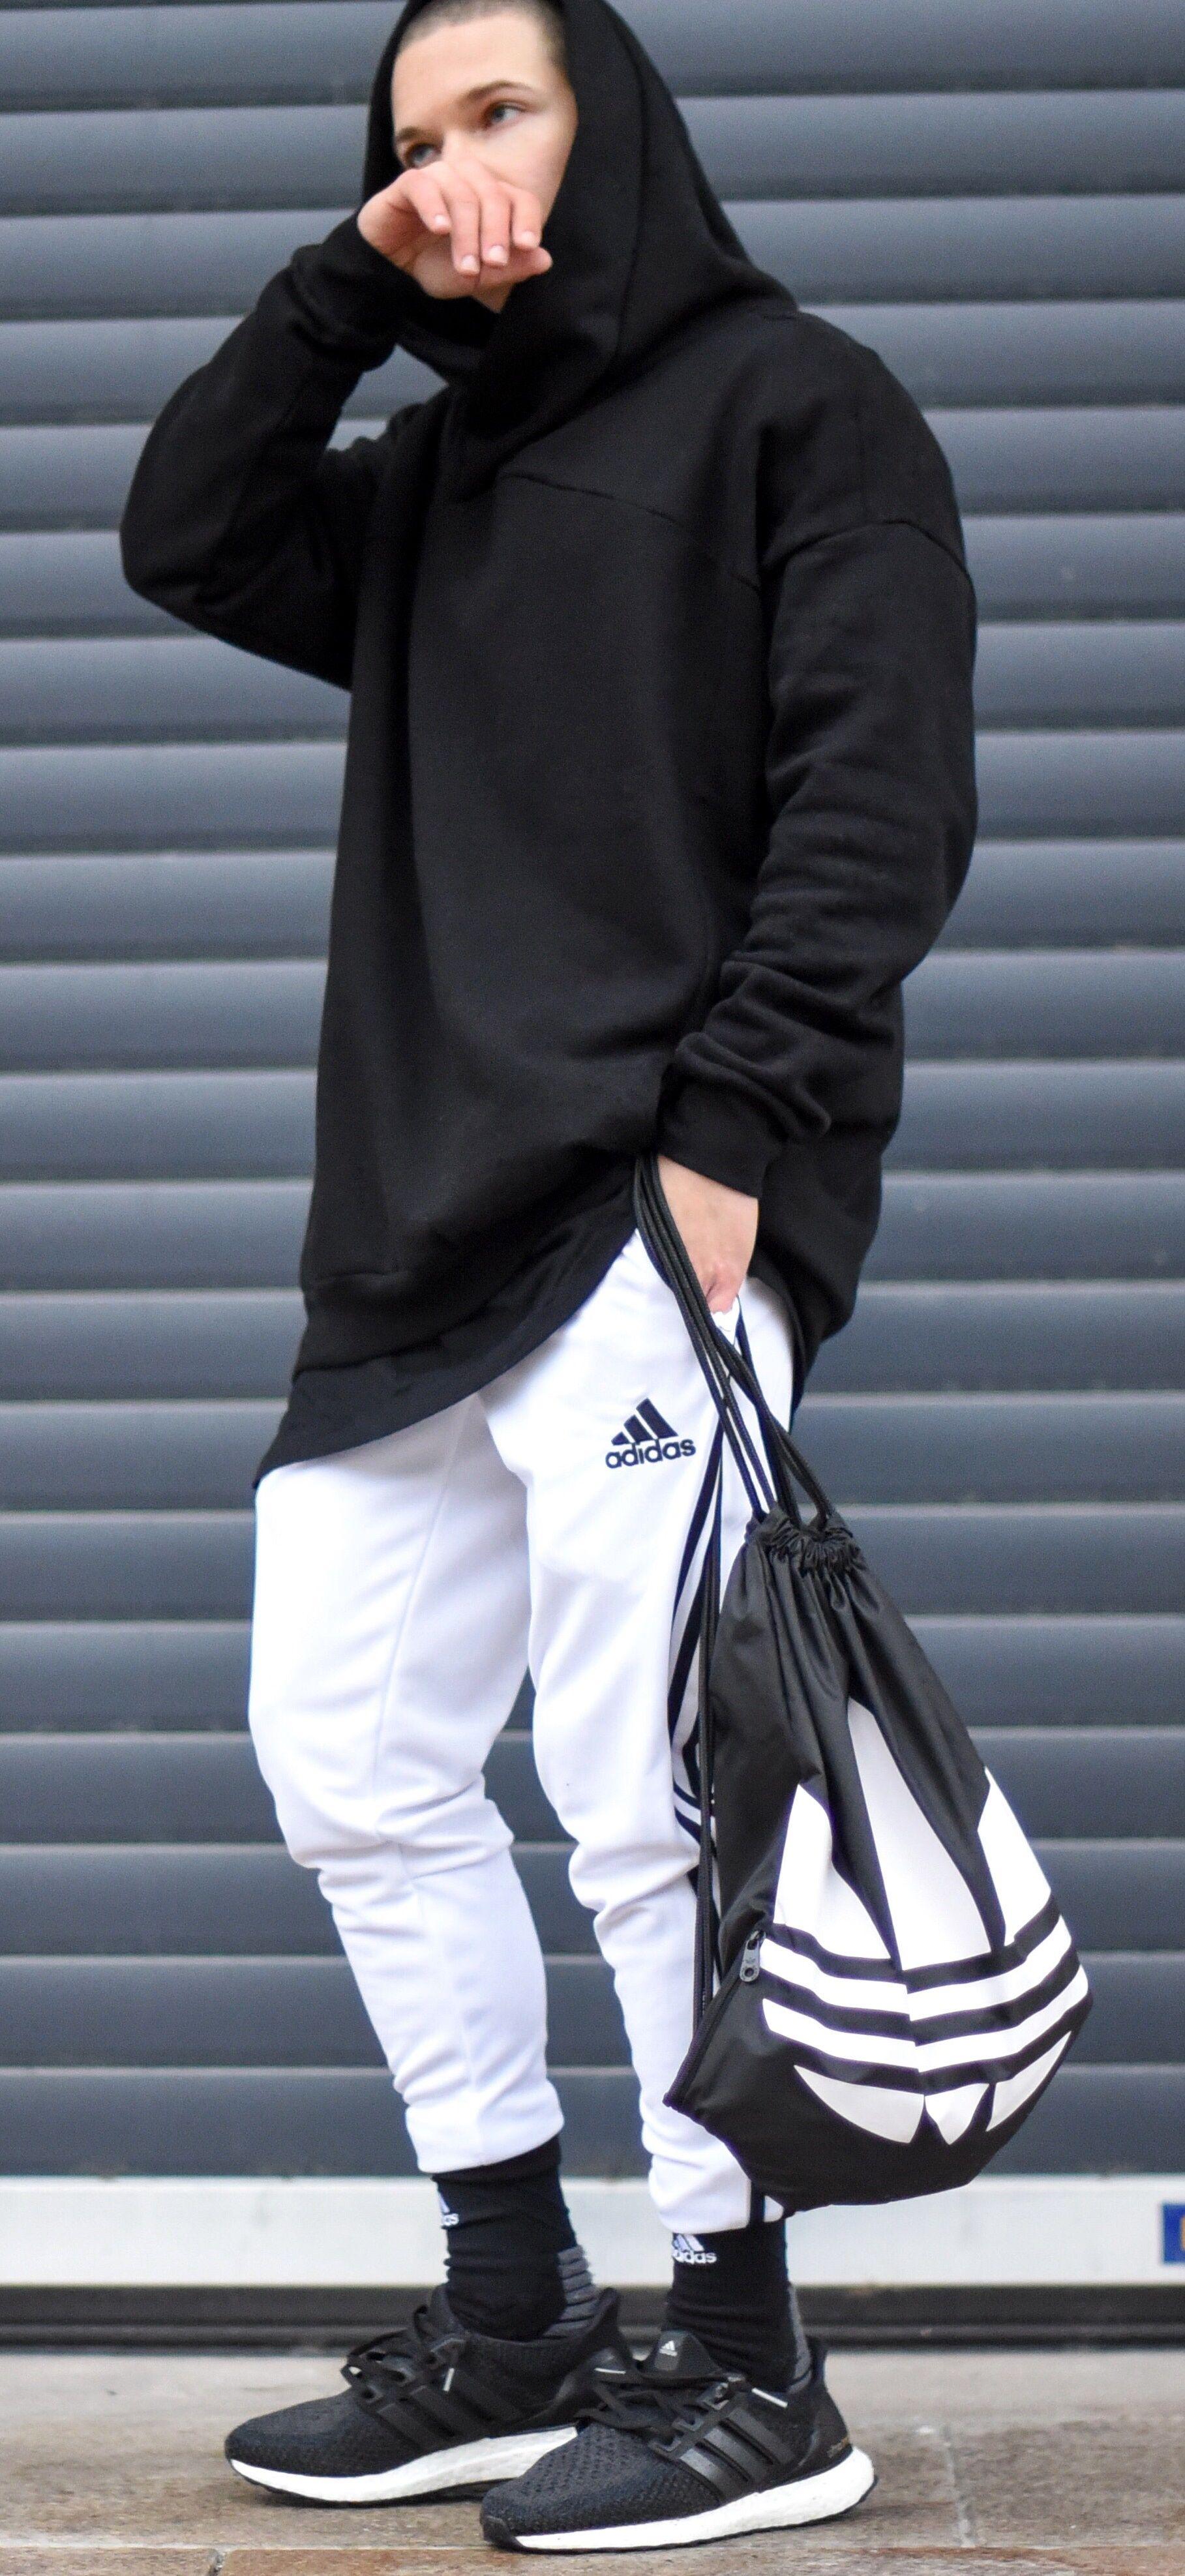 SWAGGER | FASHION. BLVCK. MEN. | Pinterest | Adidas Fashion and Menu0026#39;s fashion